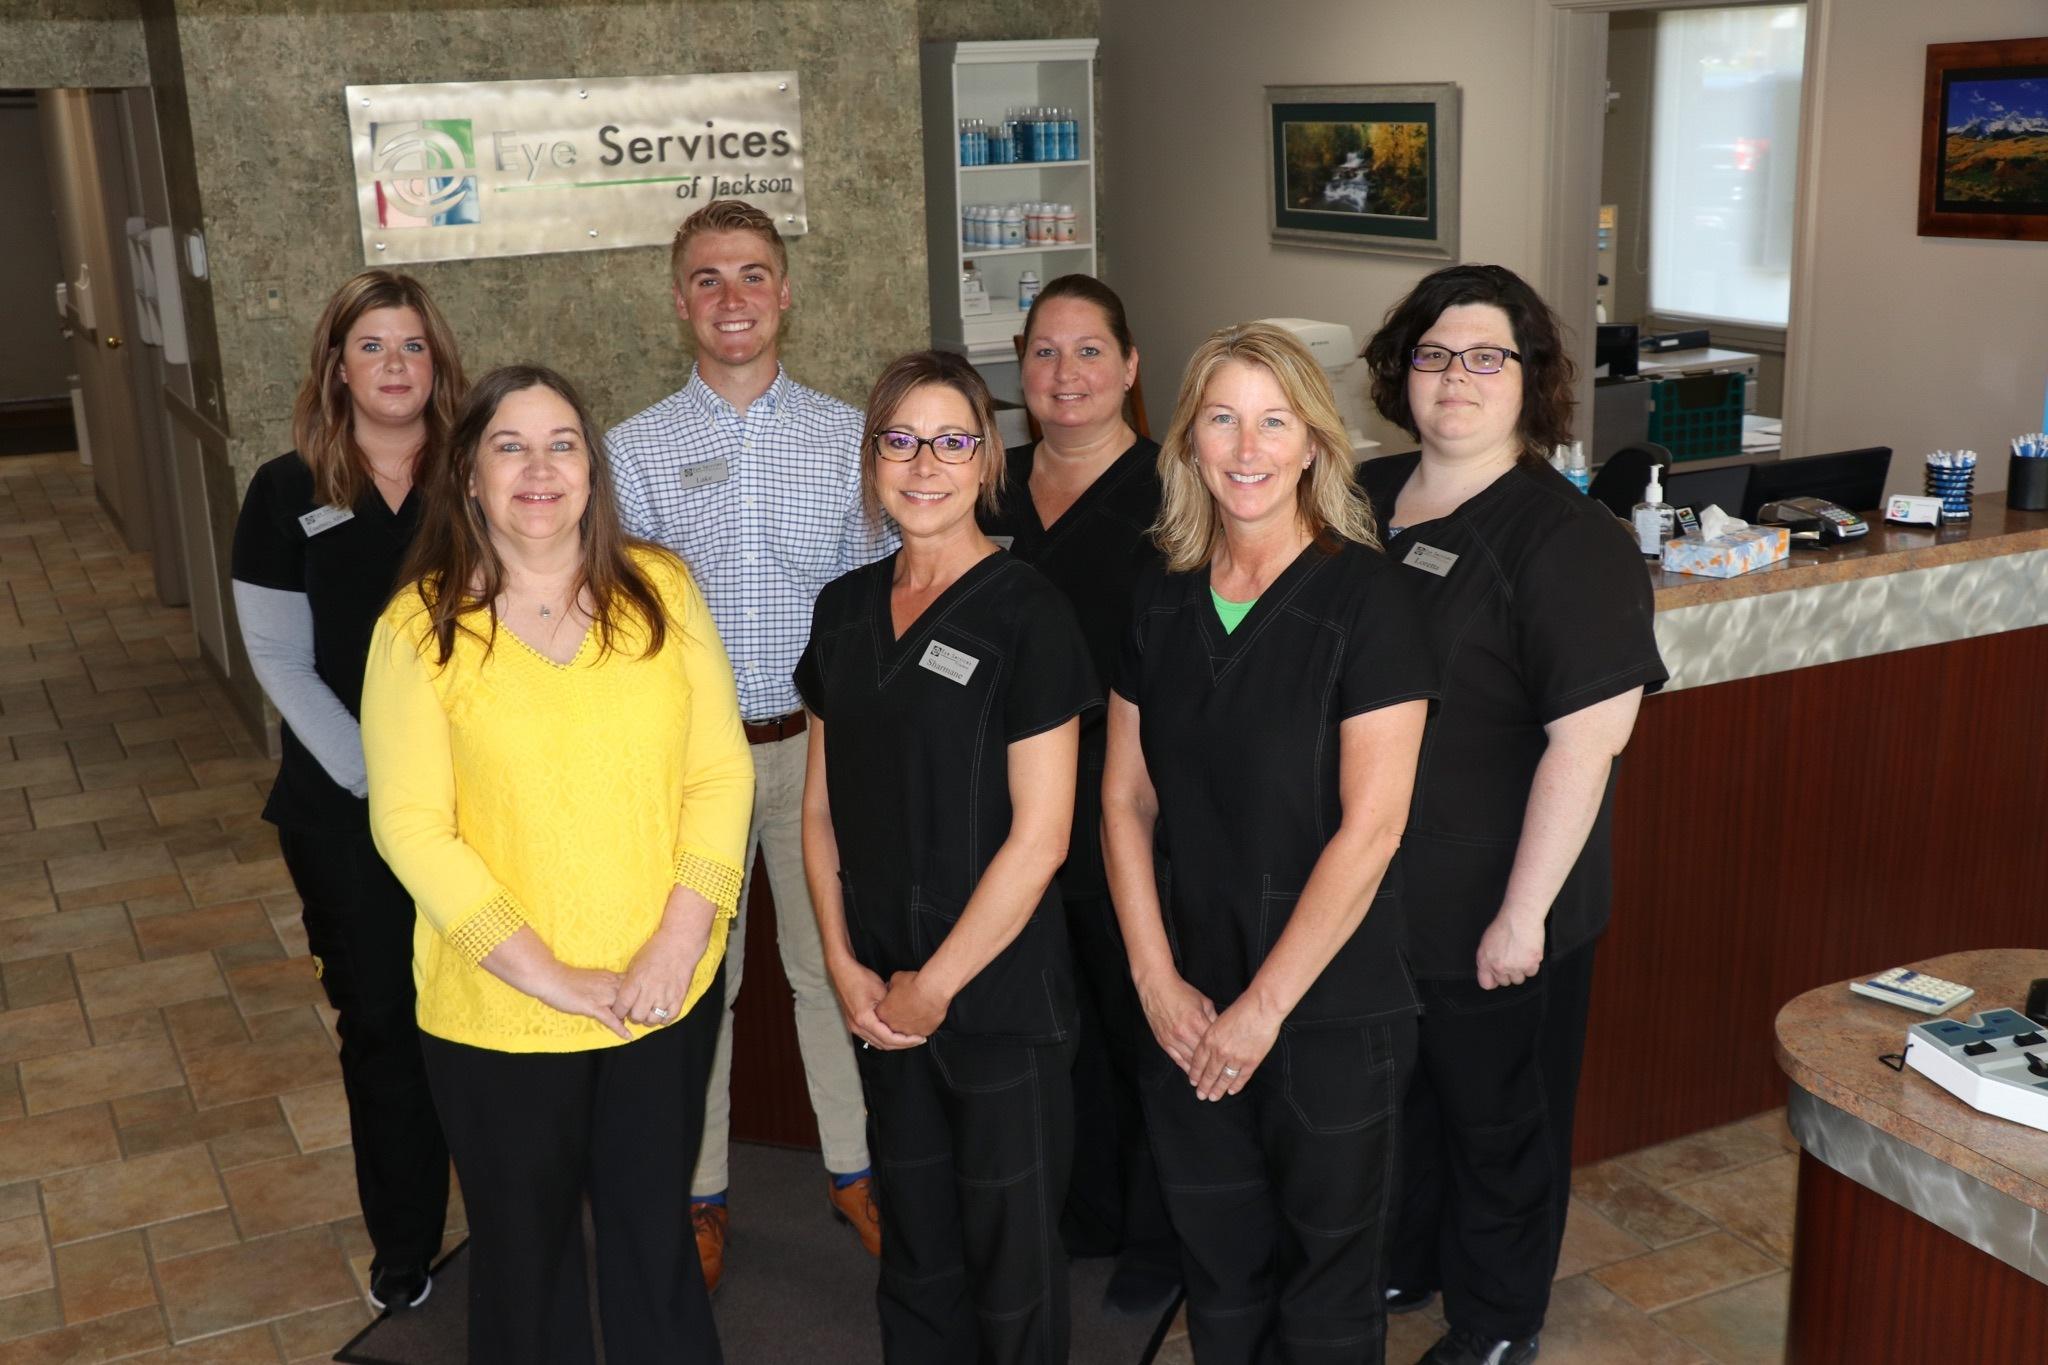 eye-services-jackson-staff-photo-6-1-18